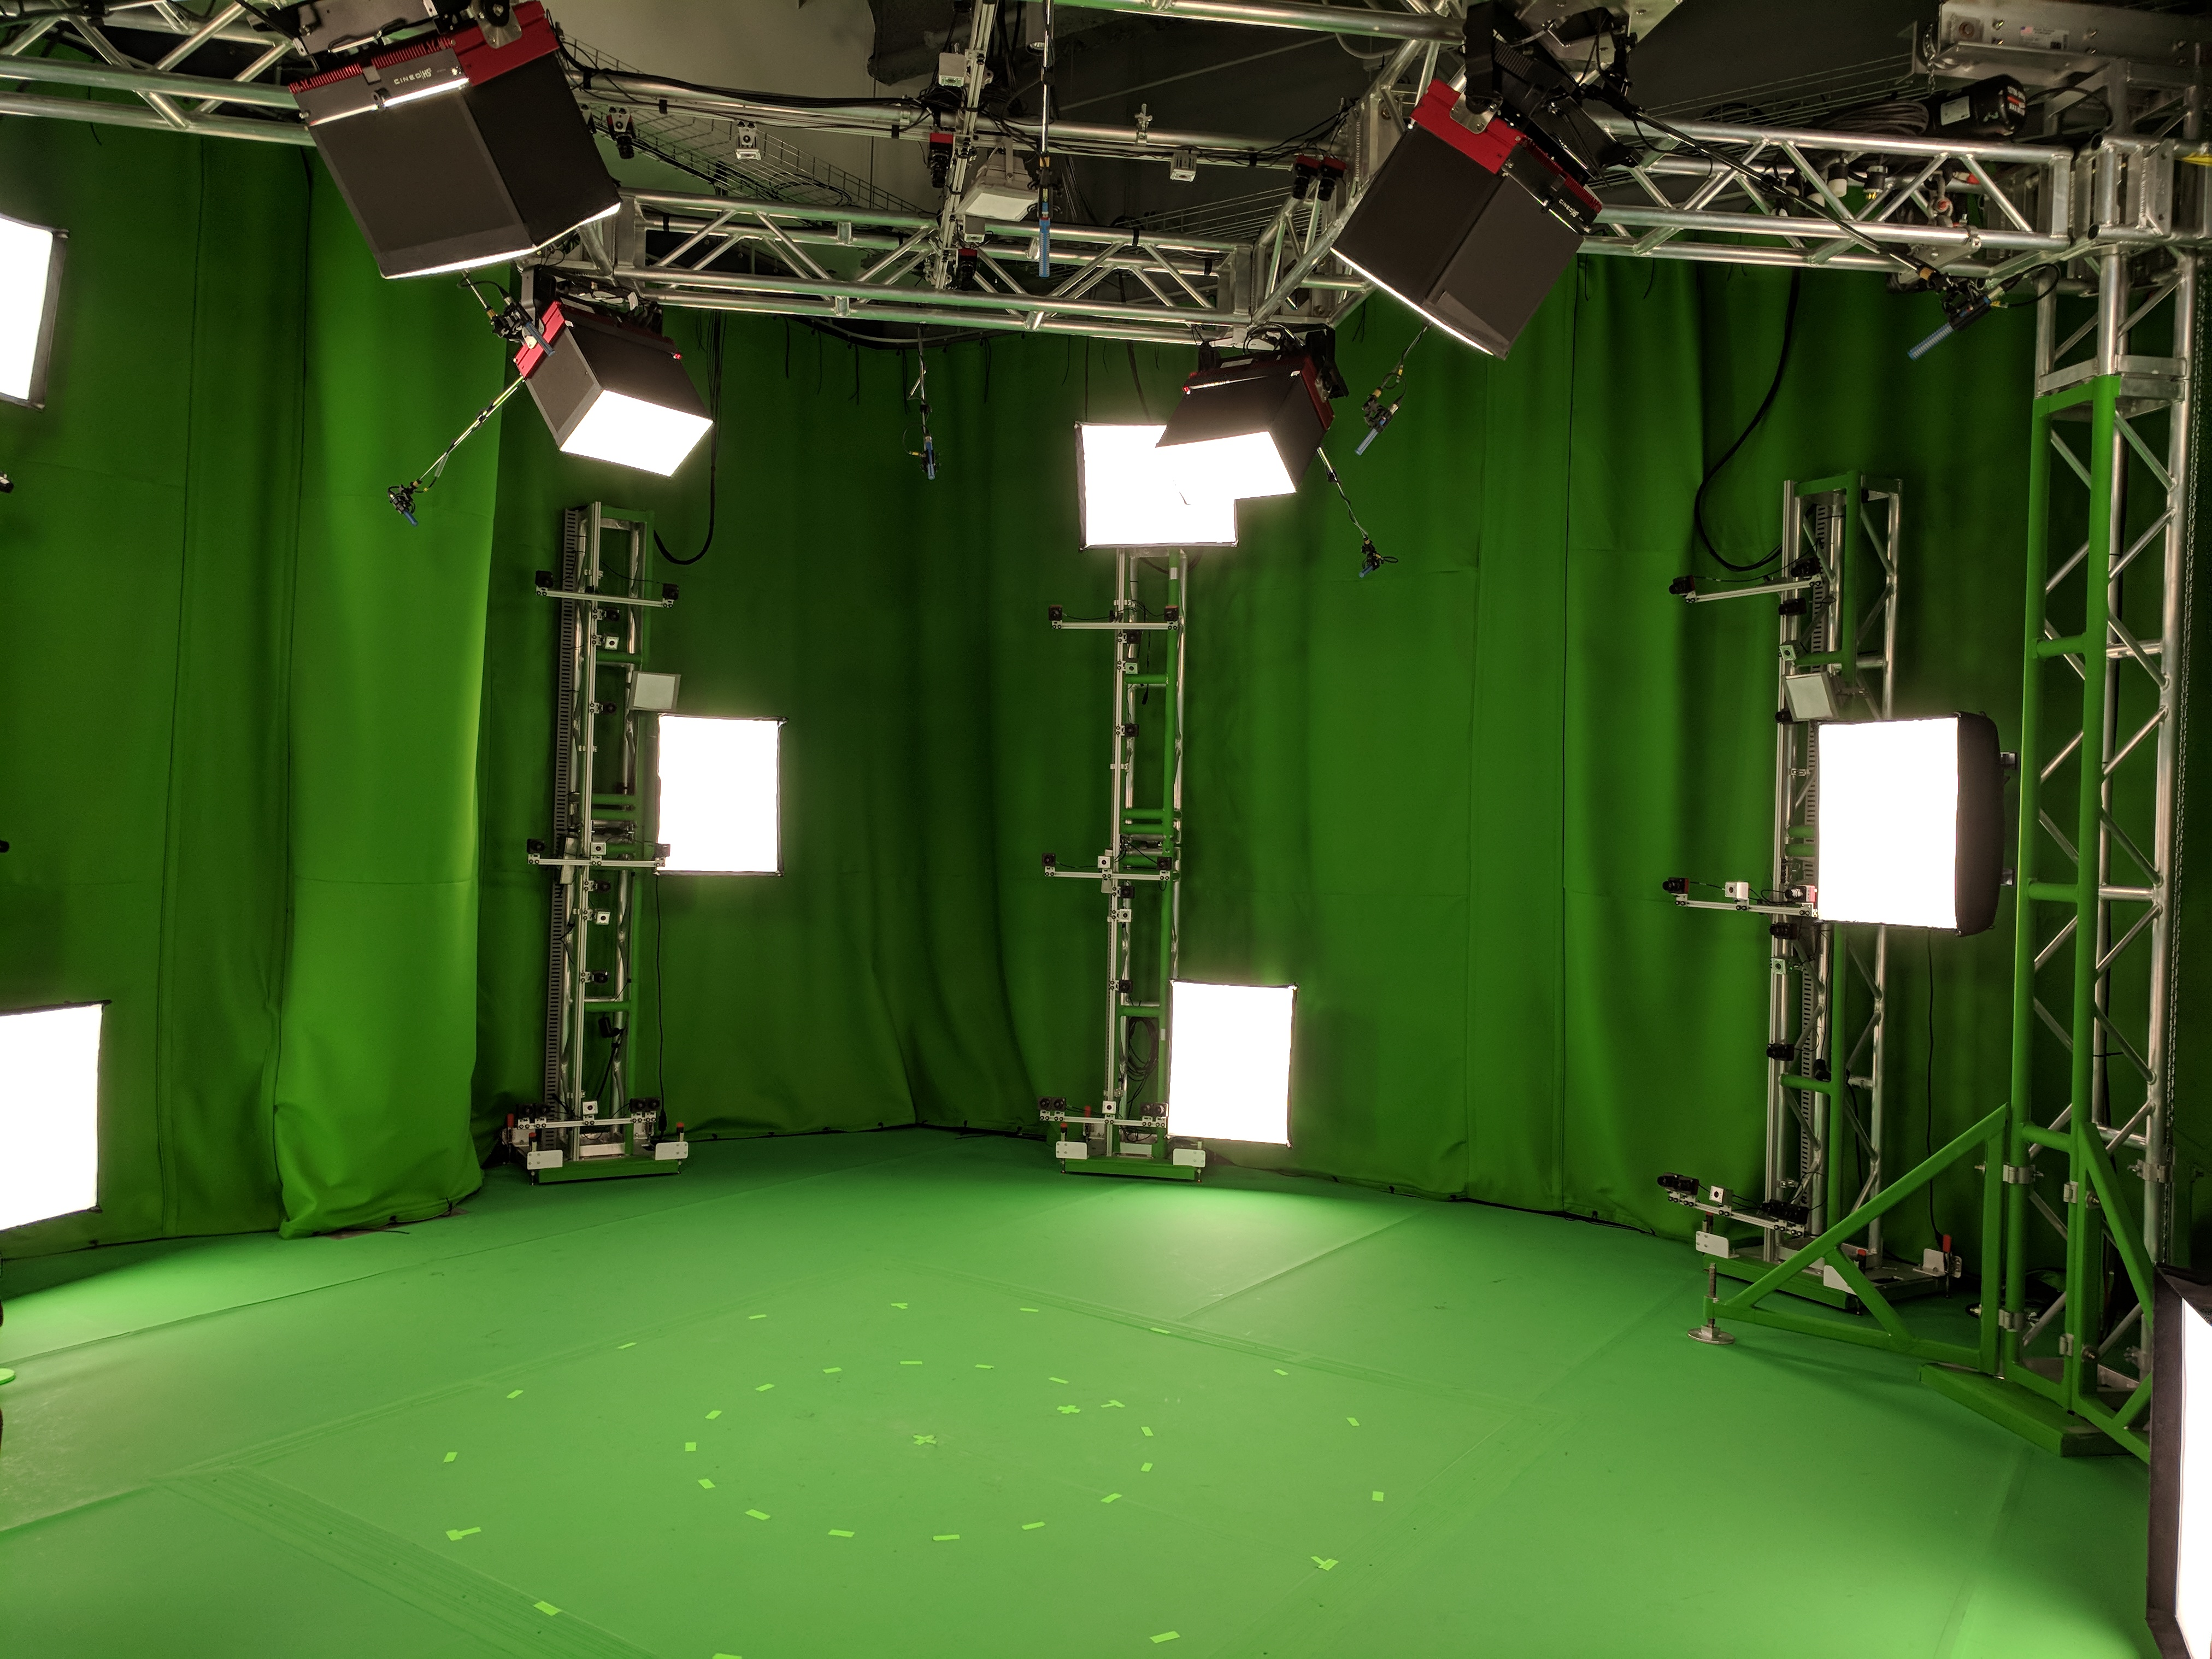 Microsoft's Mixed Reality Capture studio San Francisco